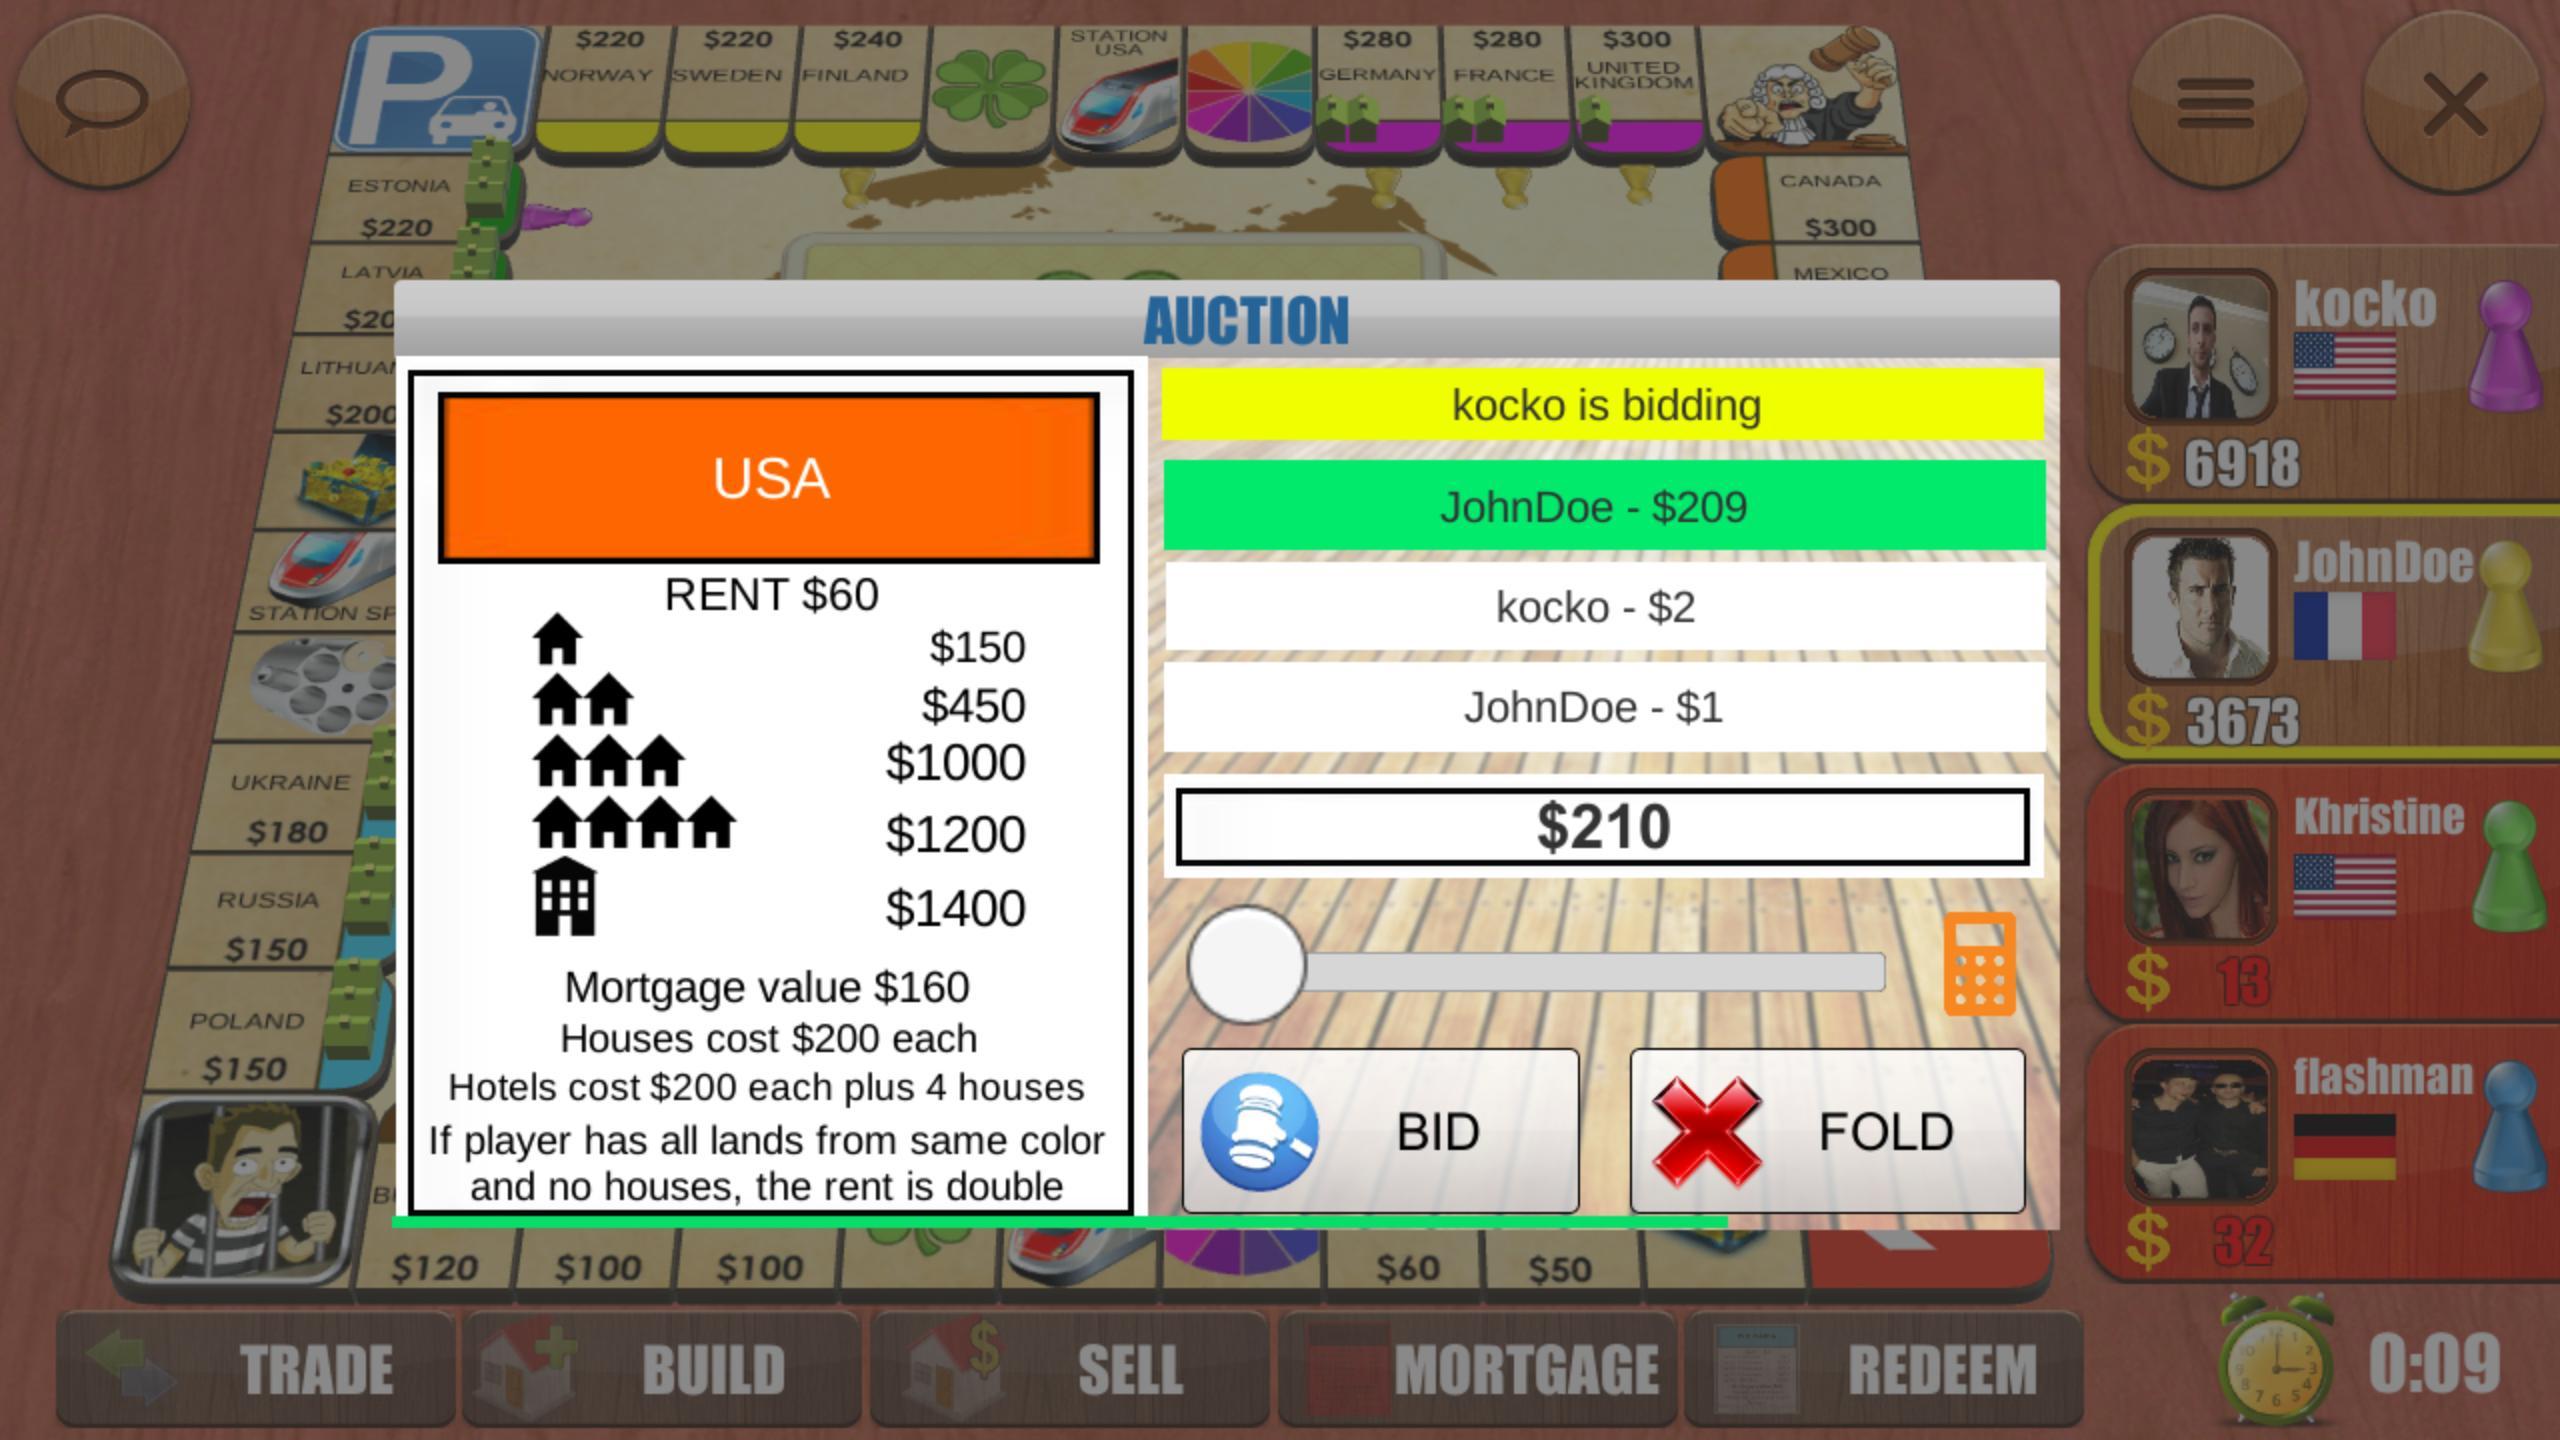 Rento Dice Board Game Online 5.1.9 Screenshot 6